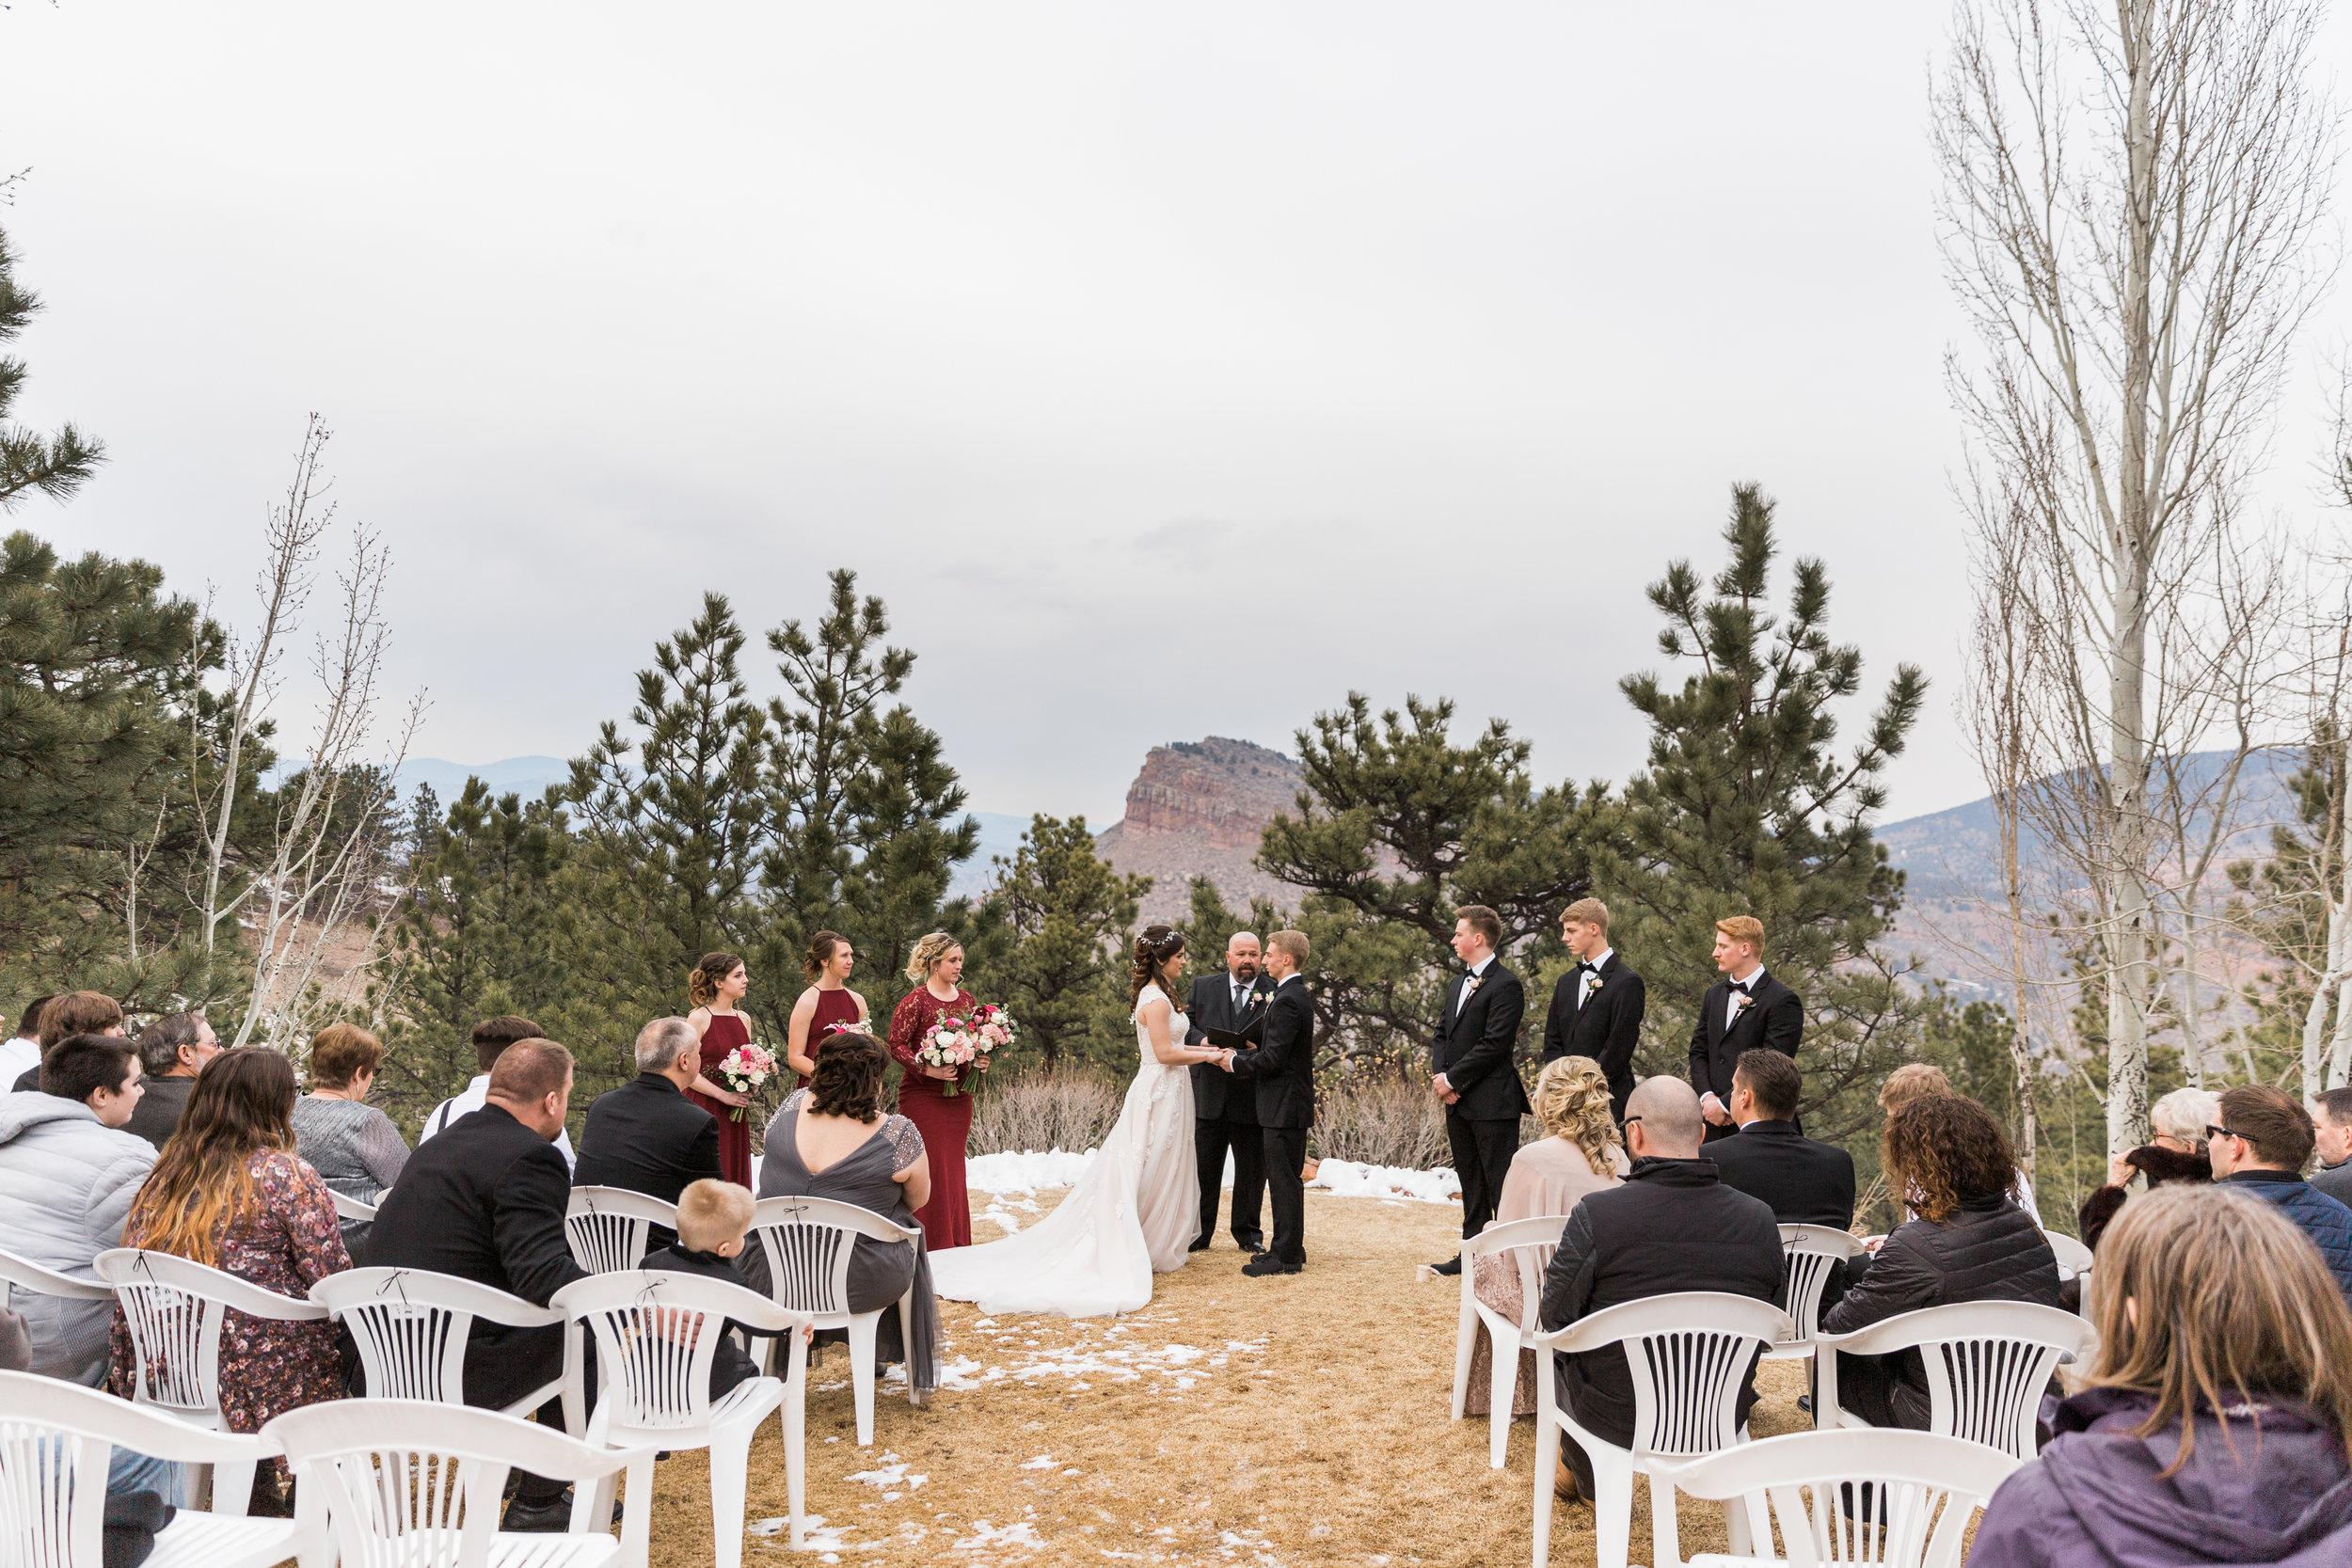 romanticcoloradodestinationwedding-30.jpg